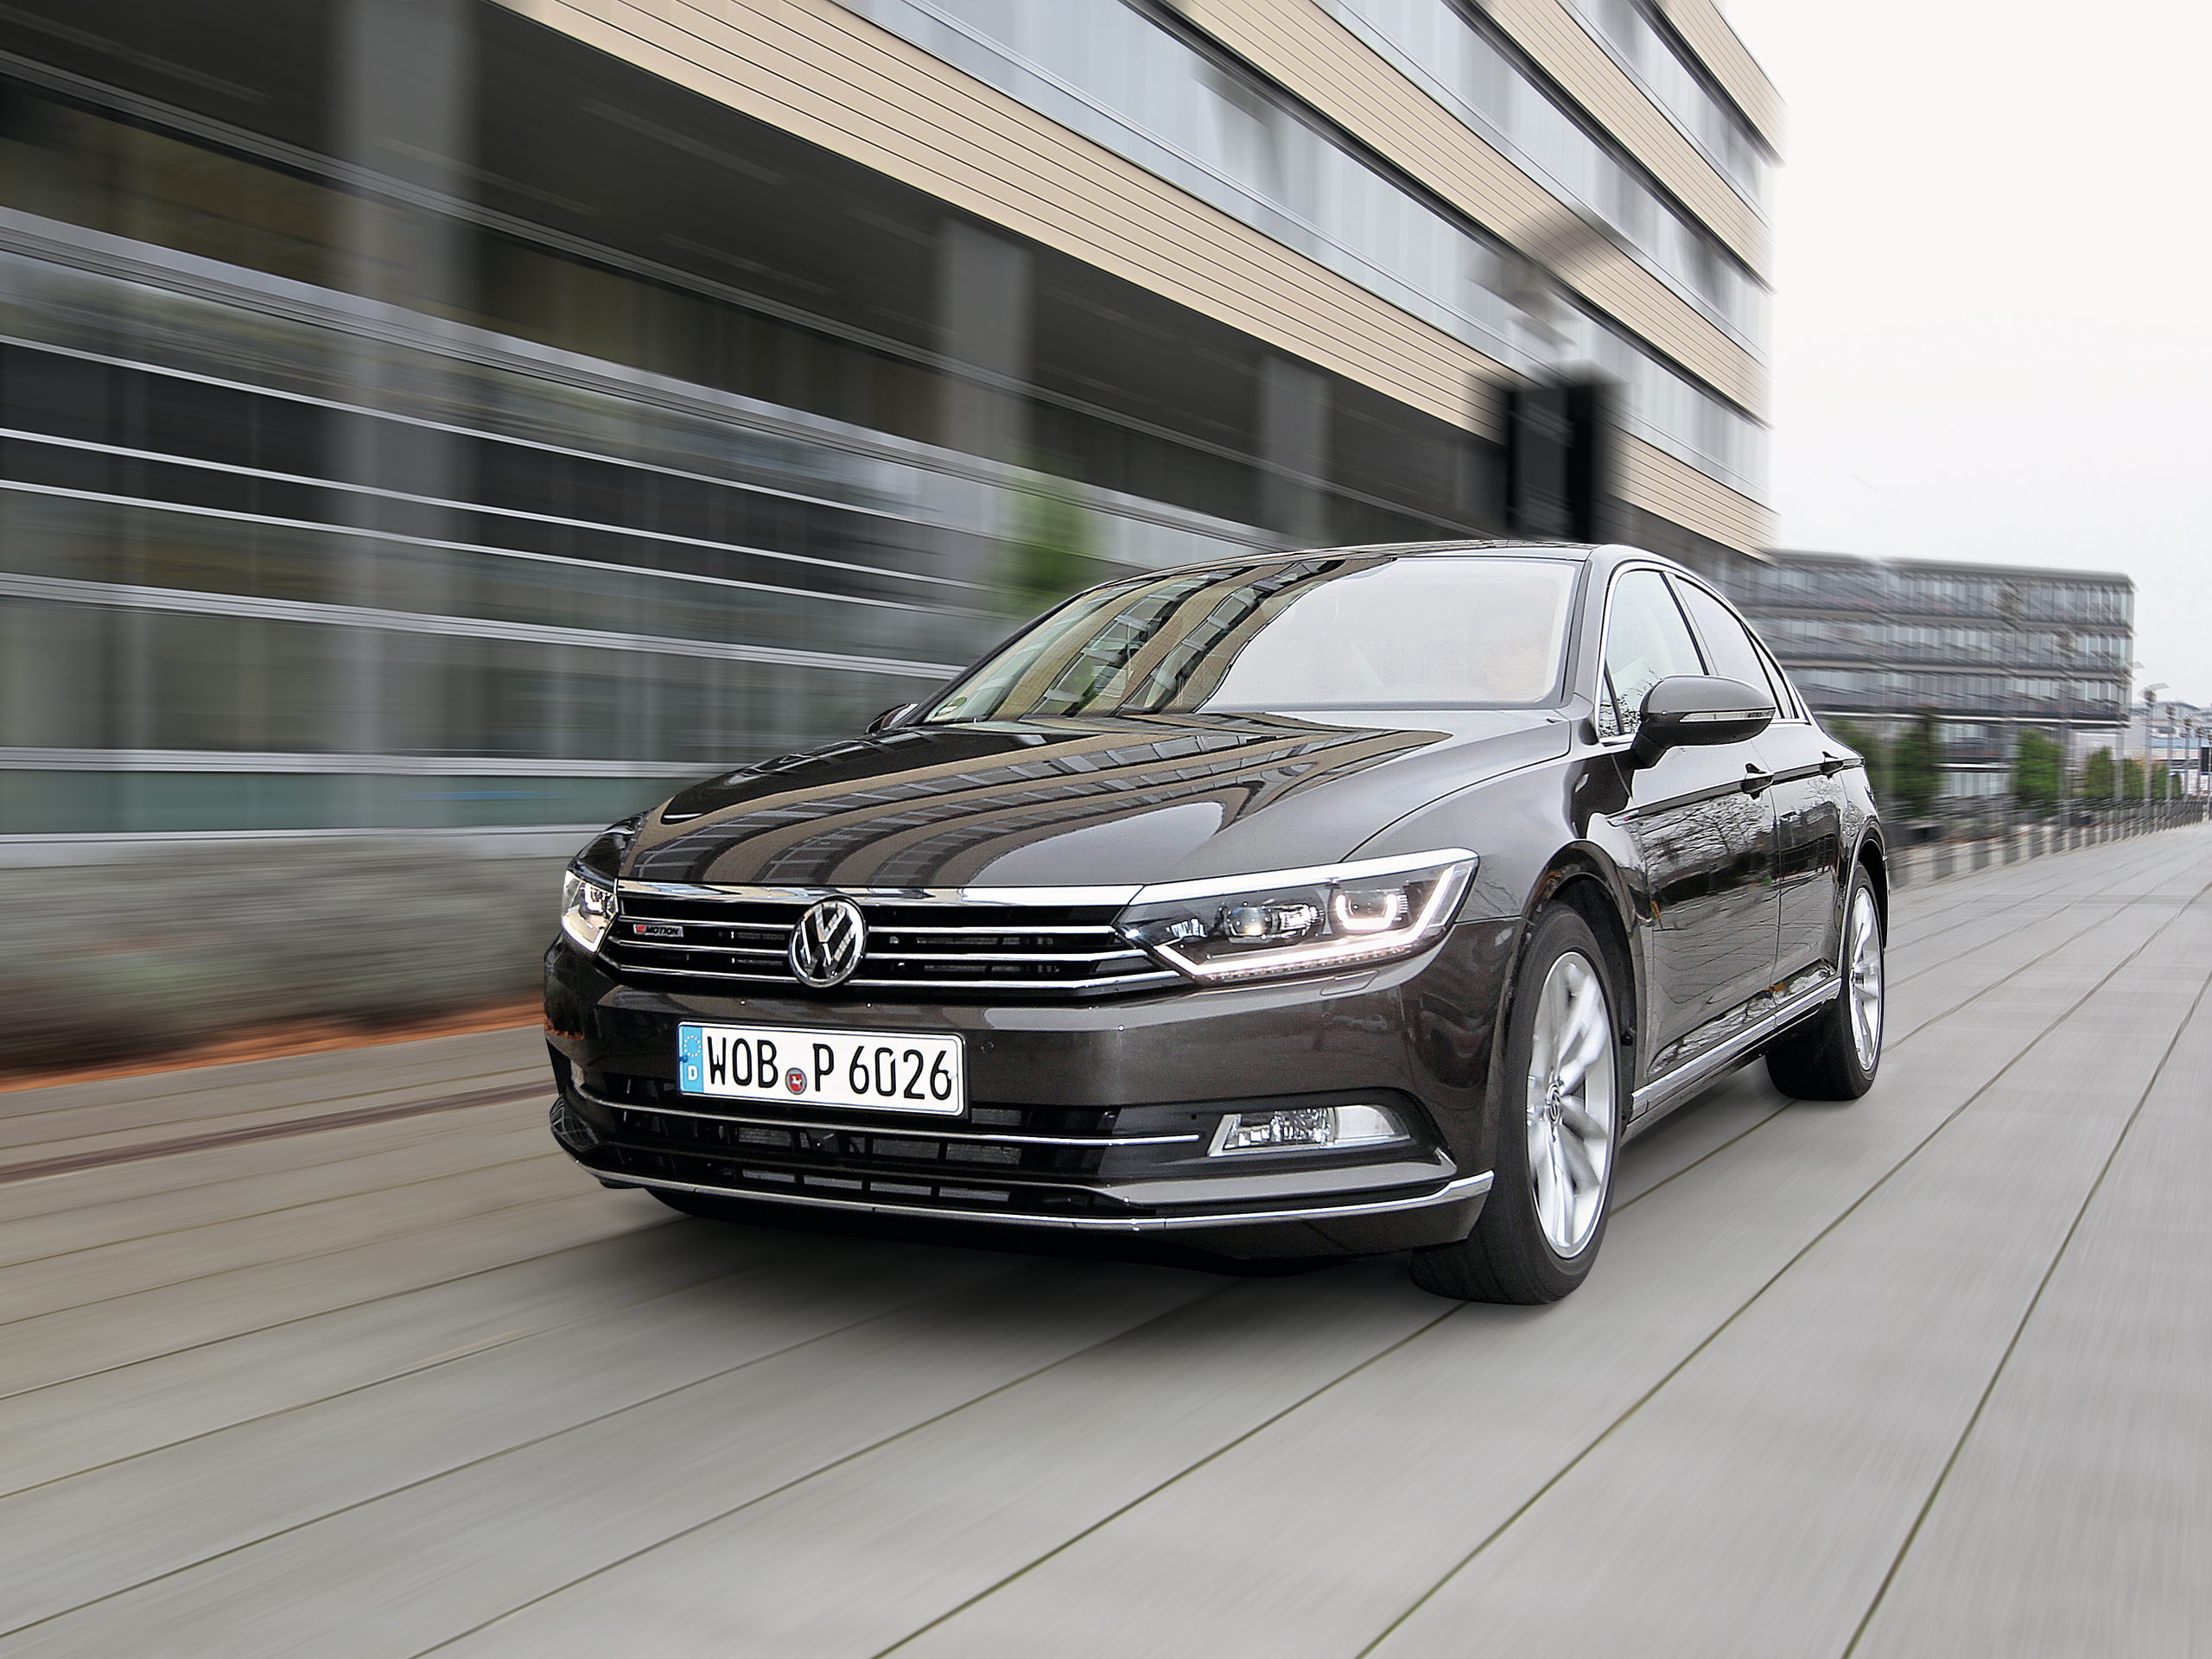 Mercedes Benz Van >> VW Passat 2.0 TDI (2015): Test | autozeitung.de